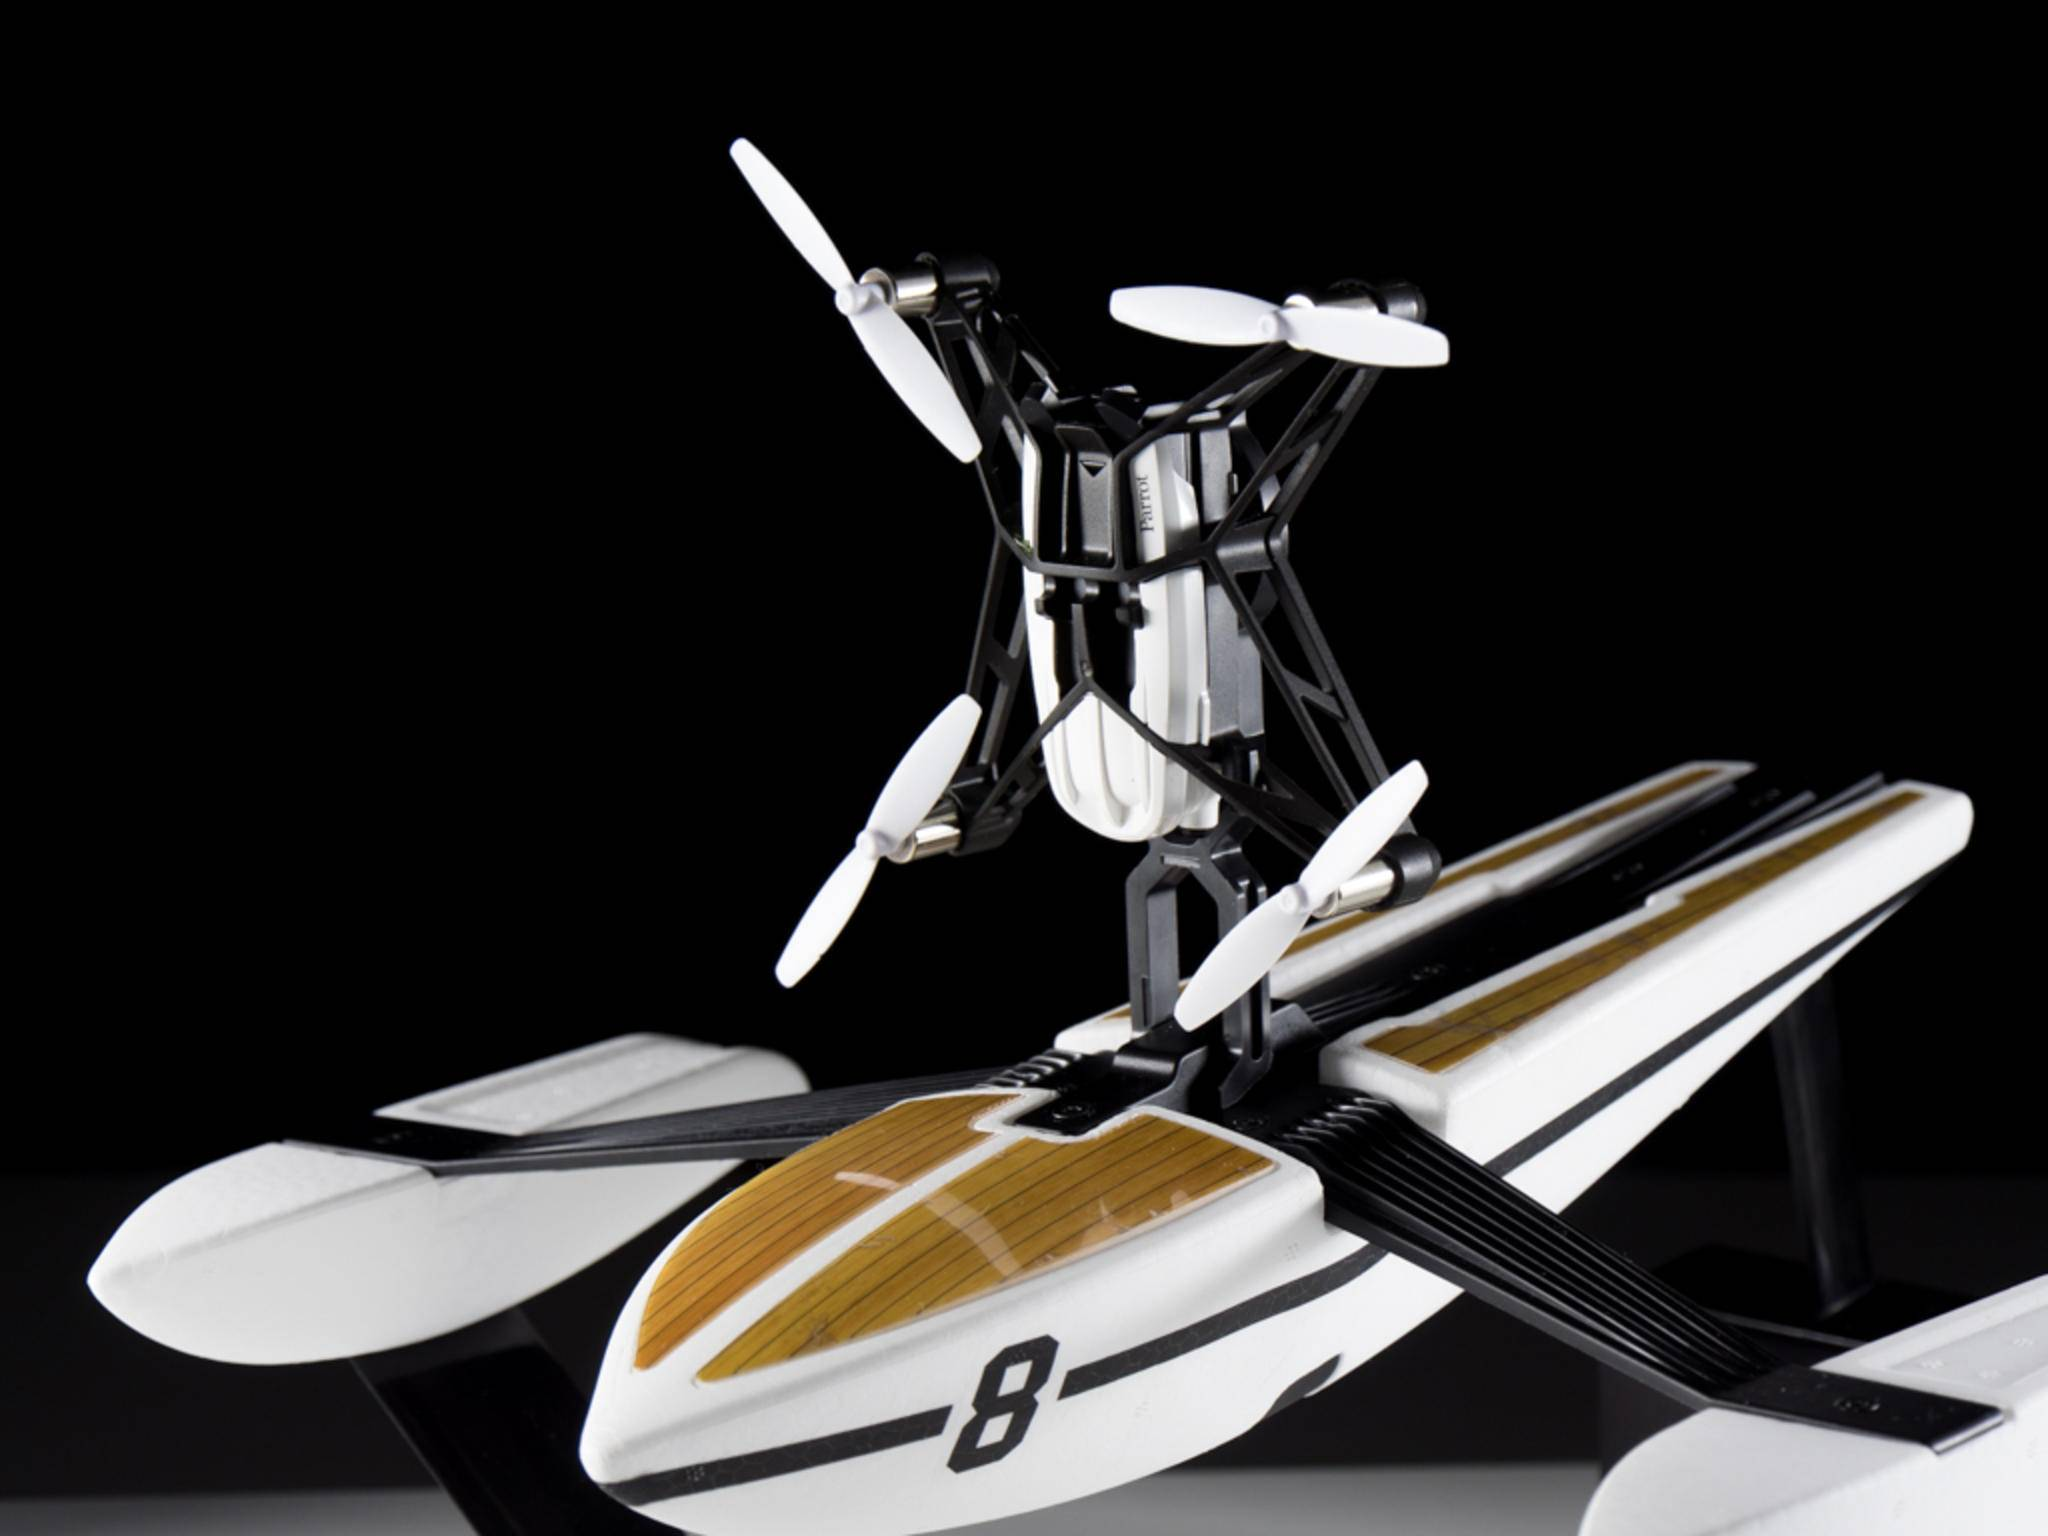 Parrot Hydrofoil Drone New Z (4 von 8)